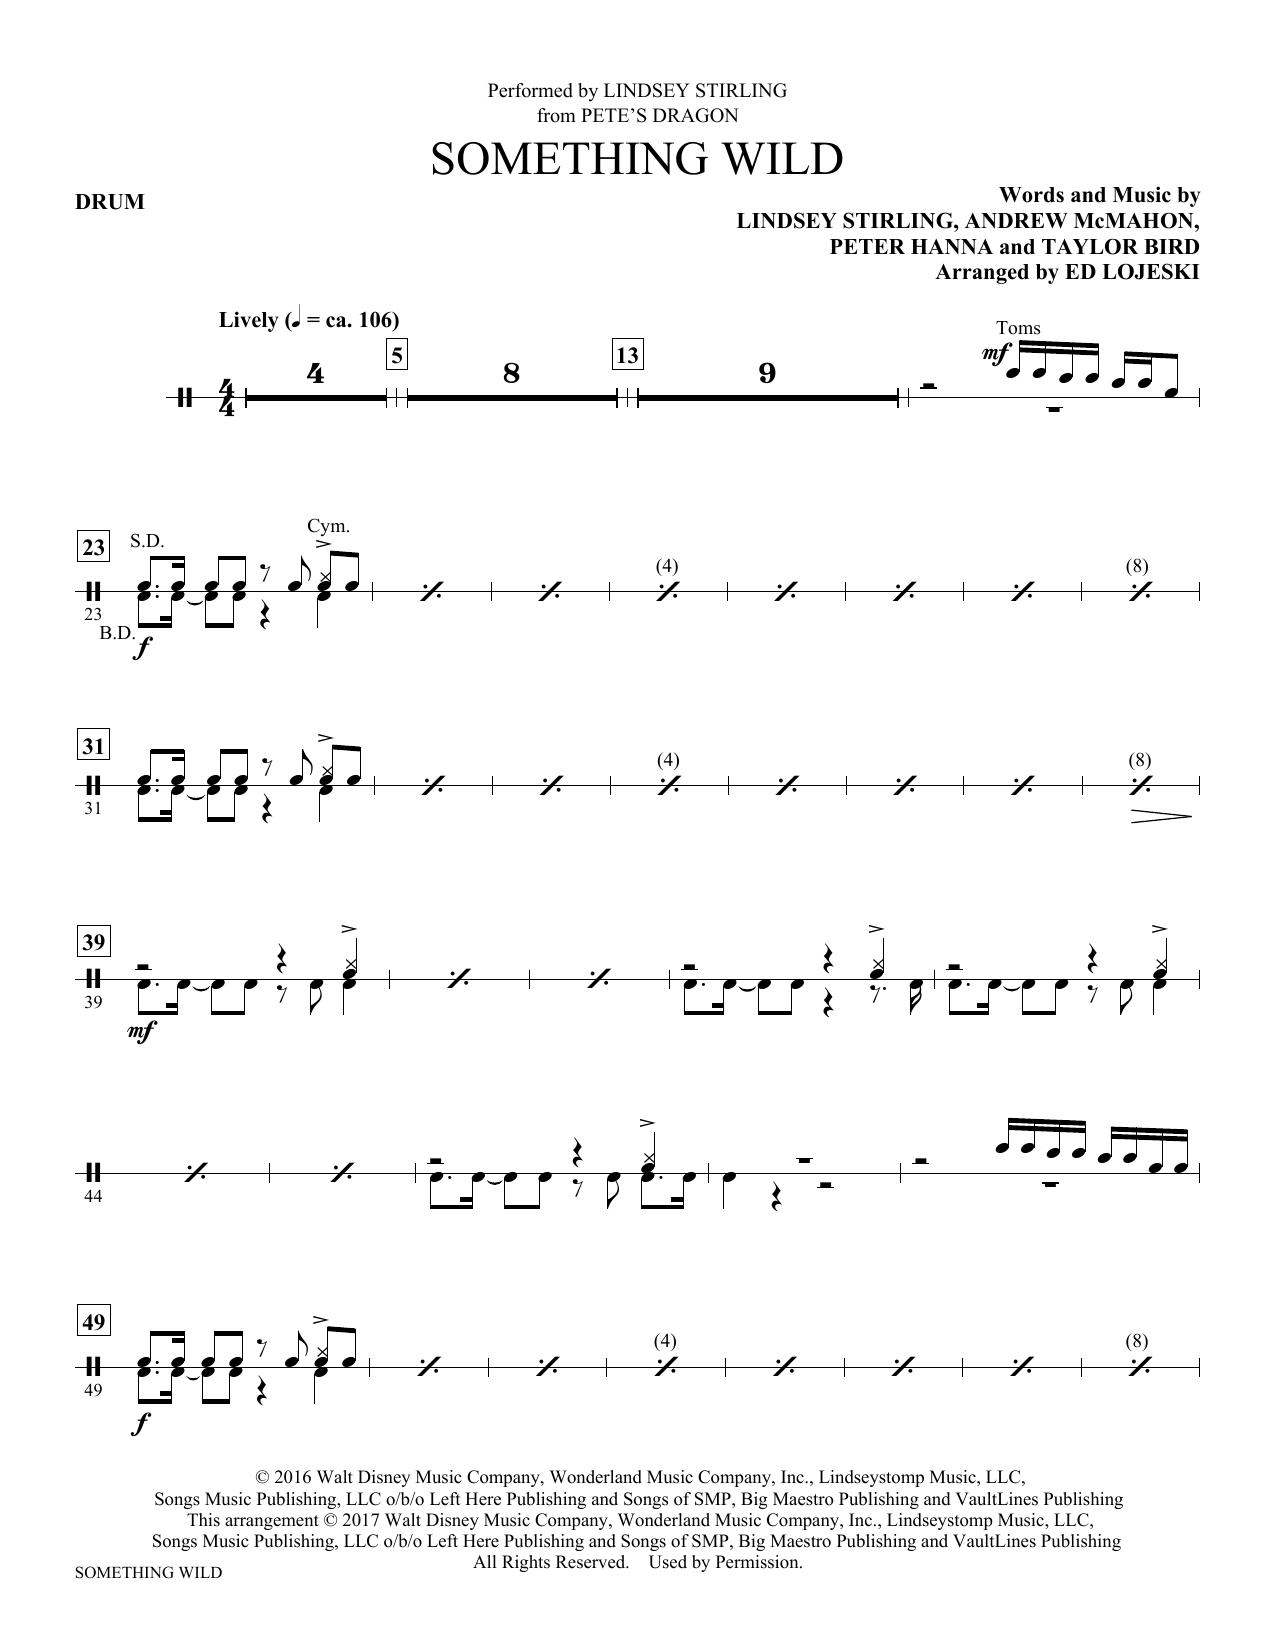 Lindsey Stirling - Something Wild - Drums